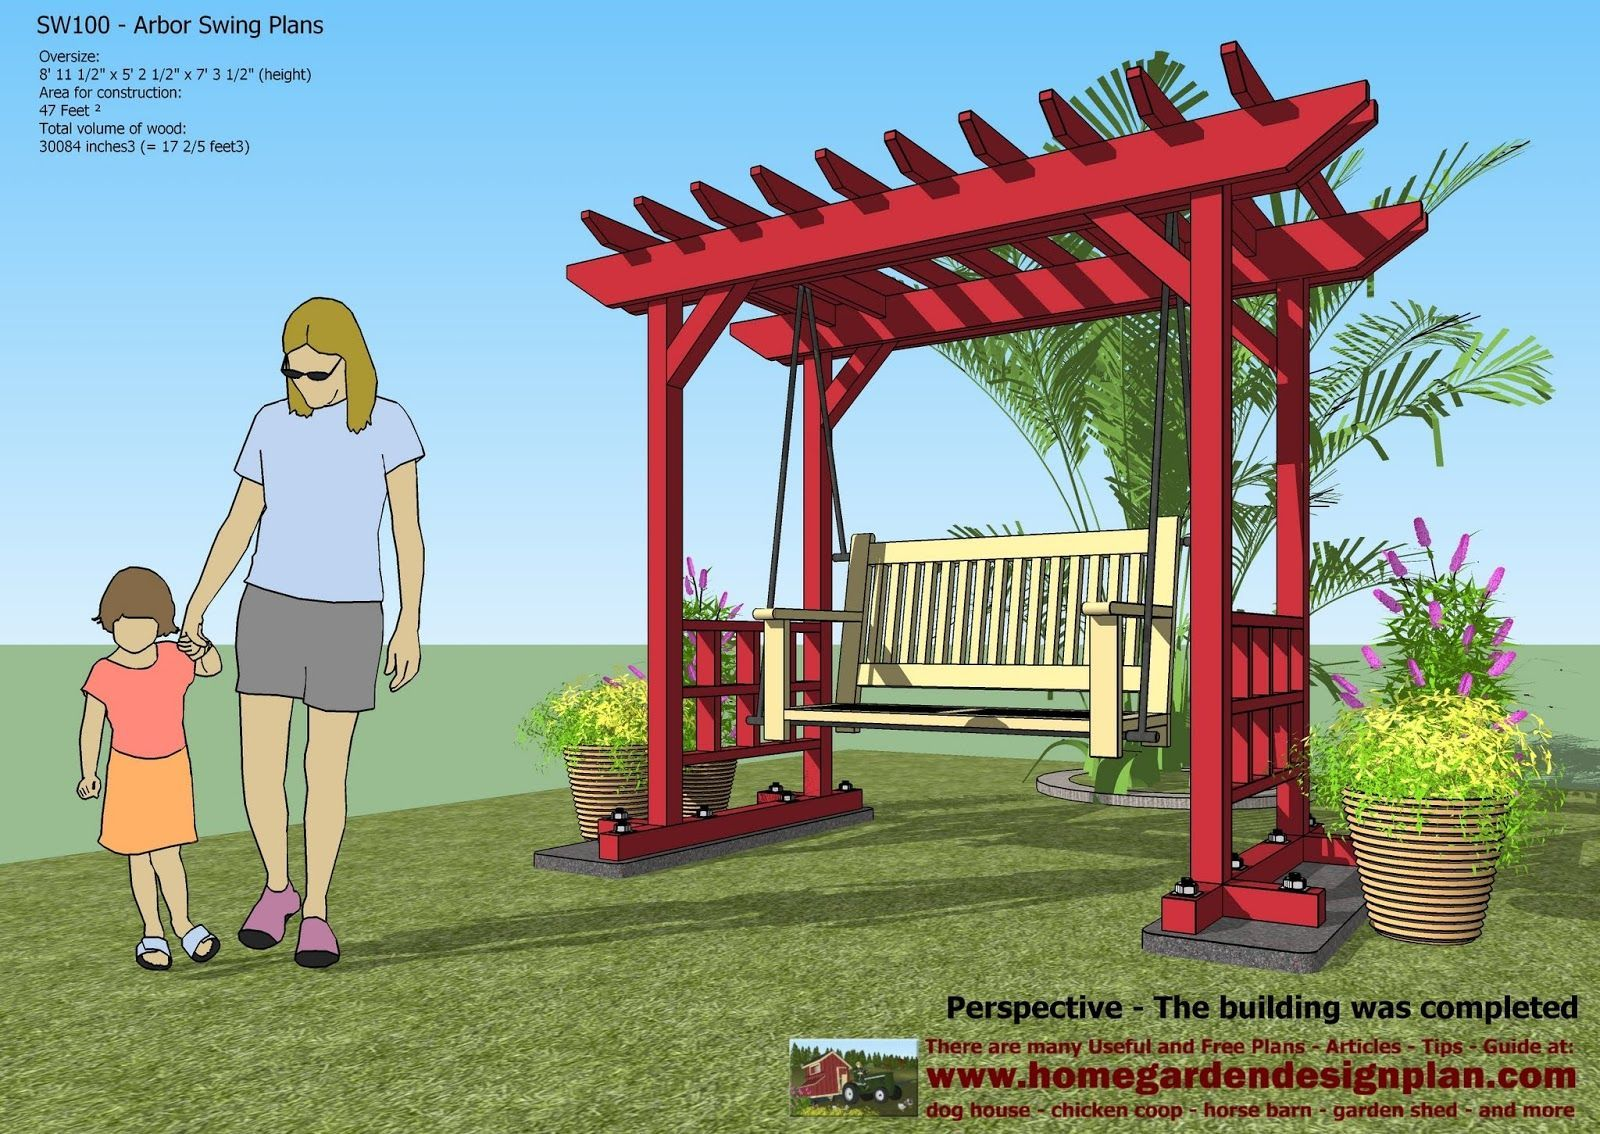 Home garden plans sw arbor swing plans swing woodworking